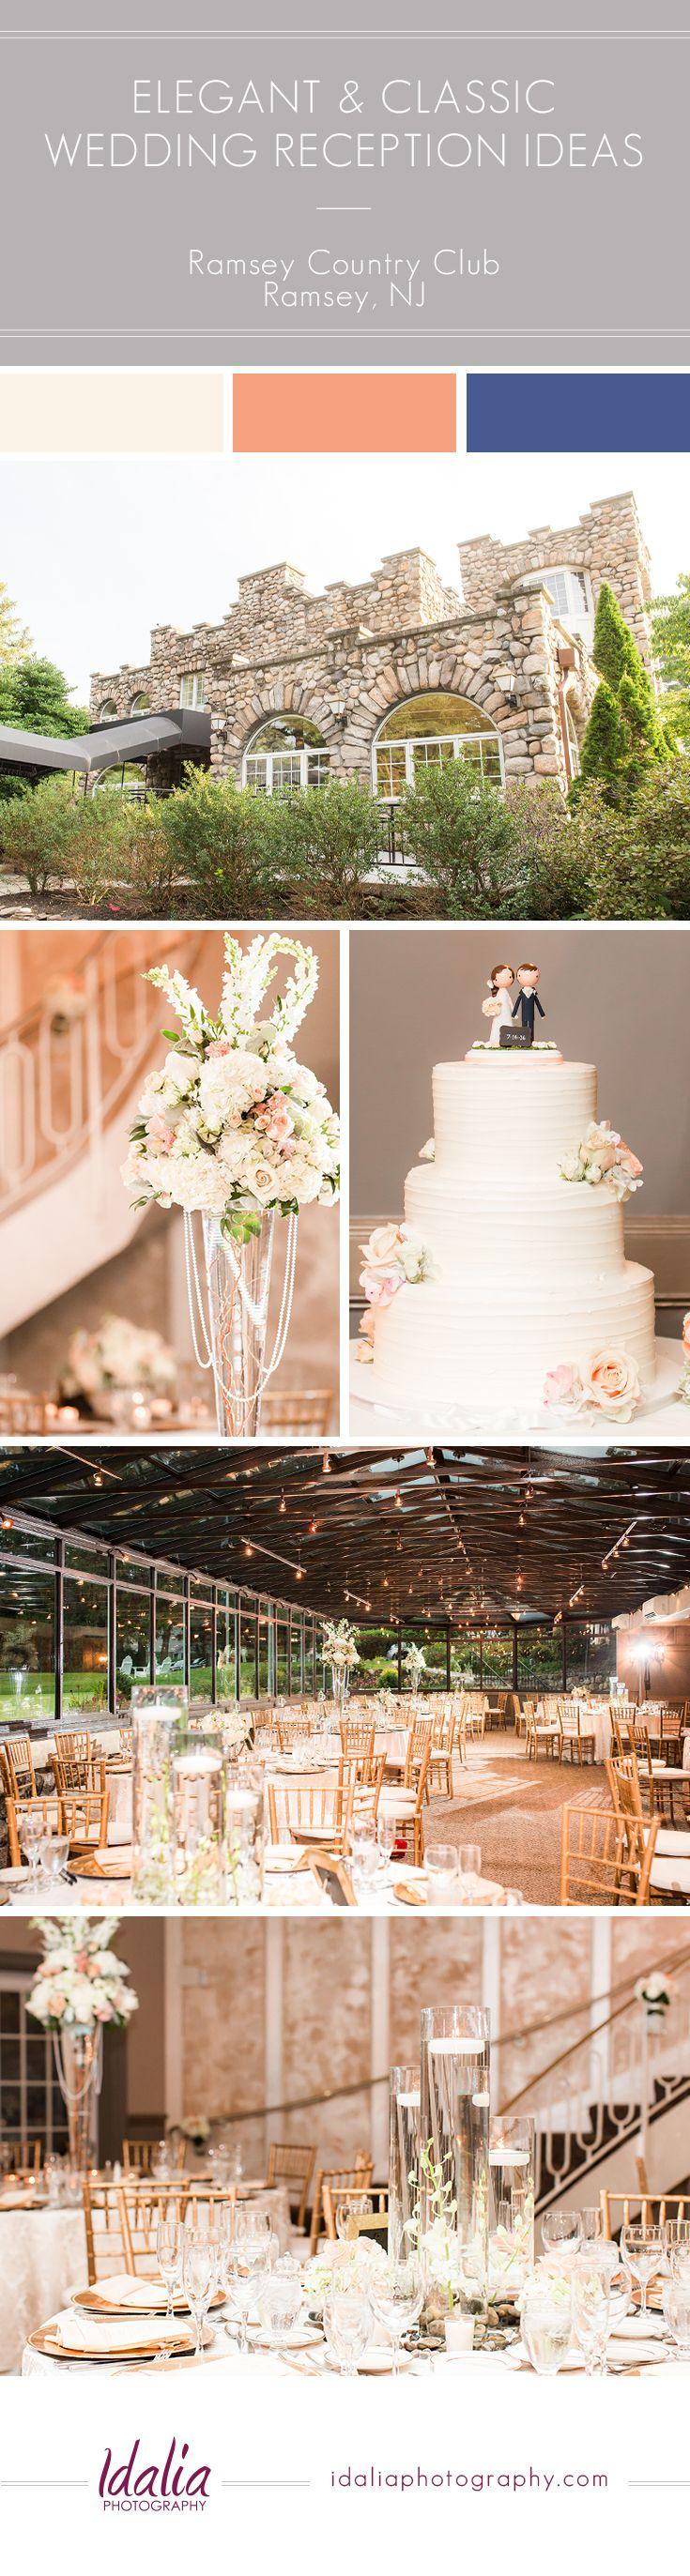 Ramsey country club wedding photos classic weddings pinterest